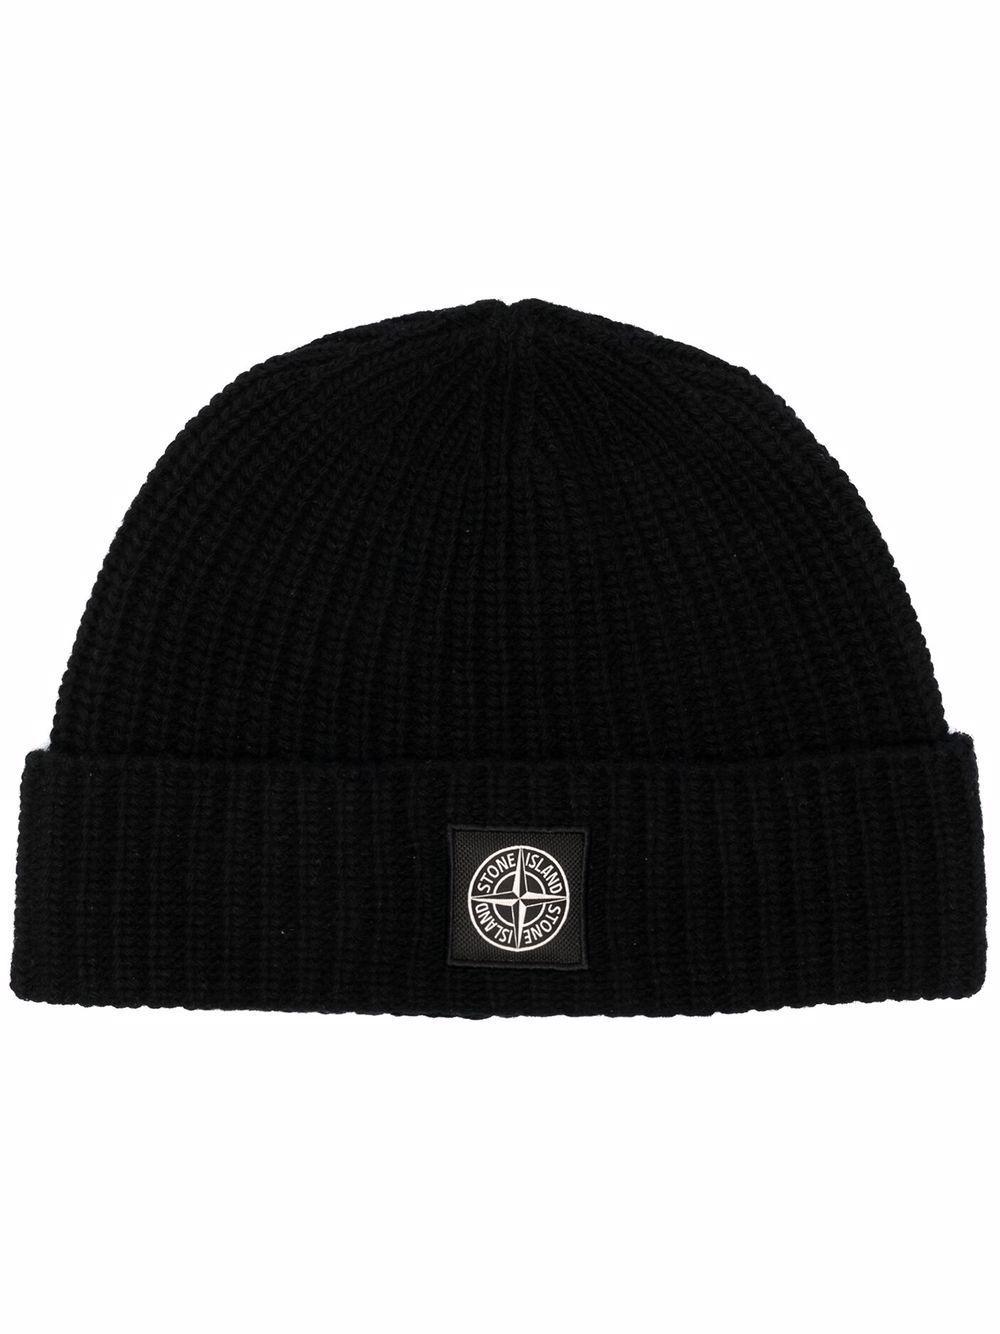 Stone island cappelli nero